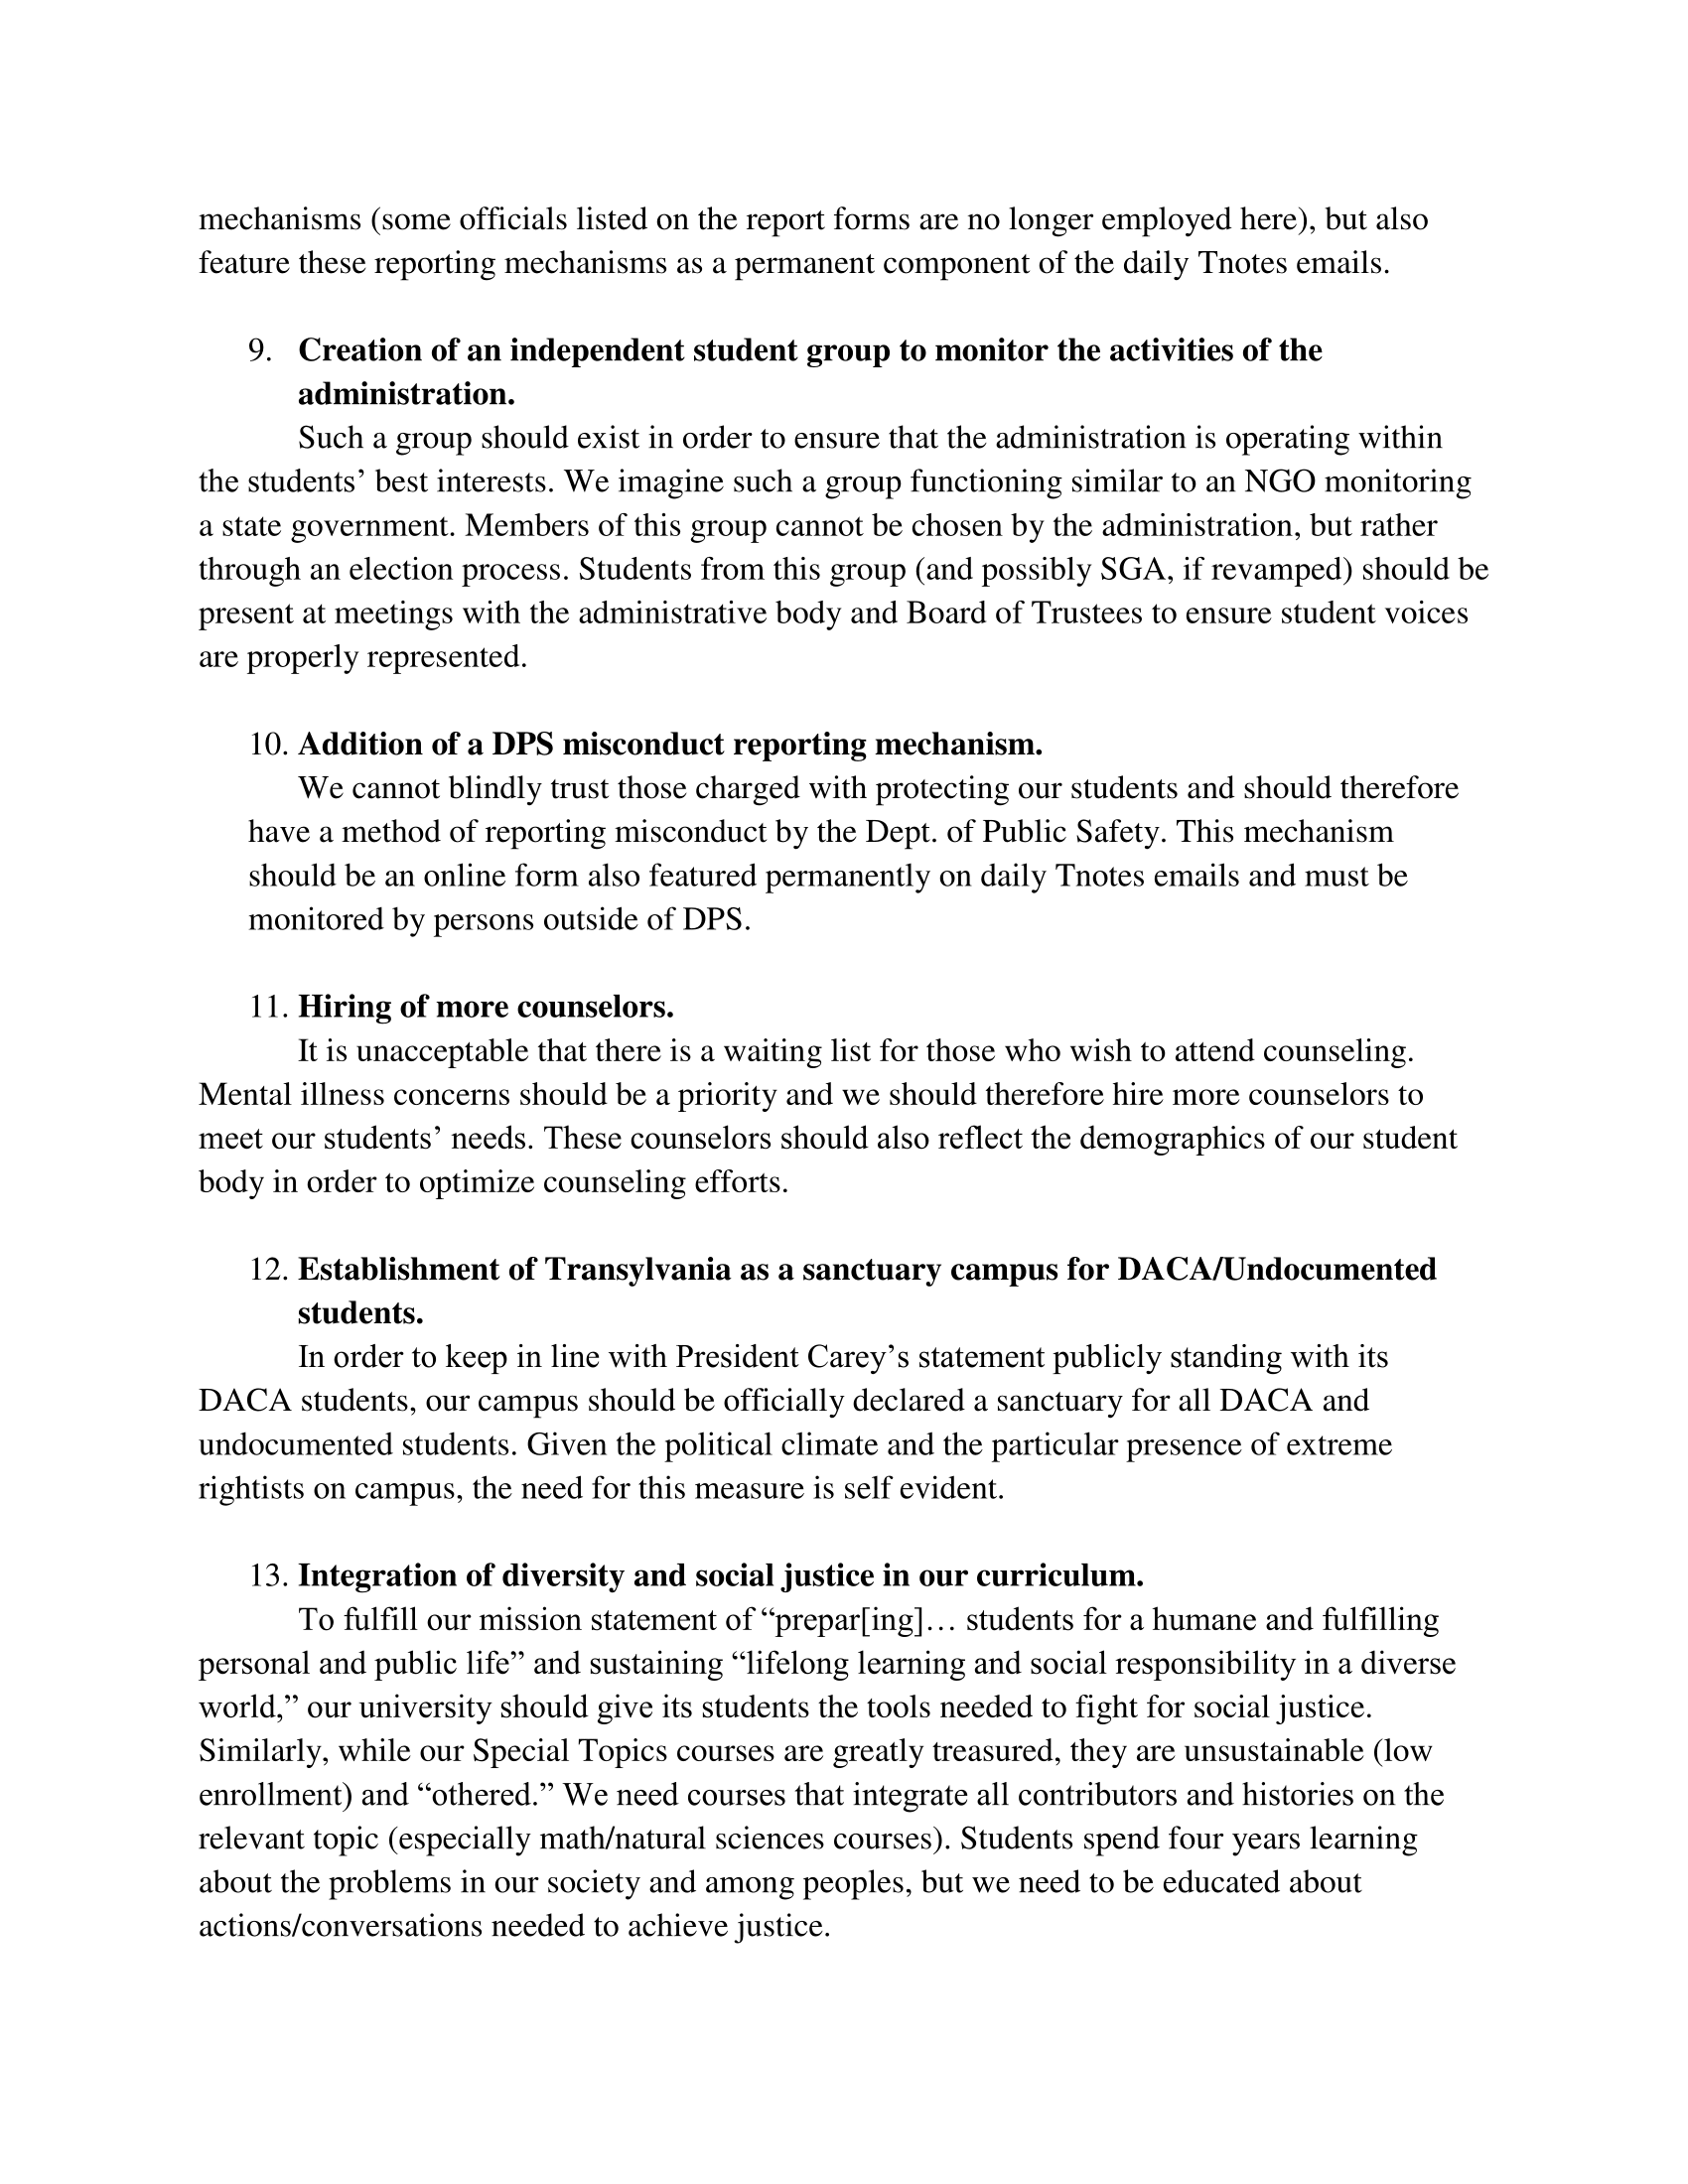 Demonstrators' list of demands, page 3